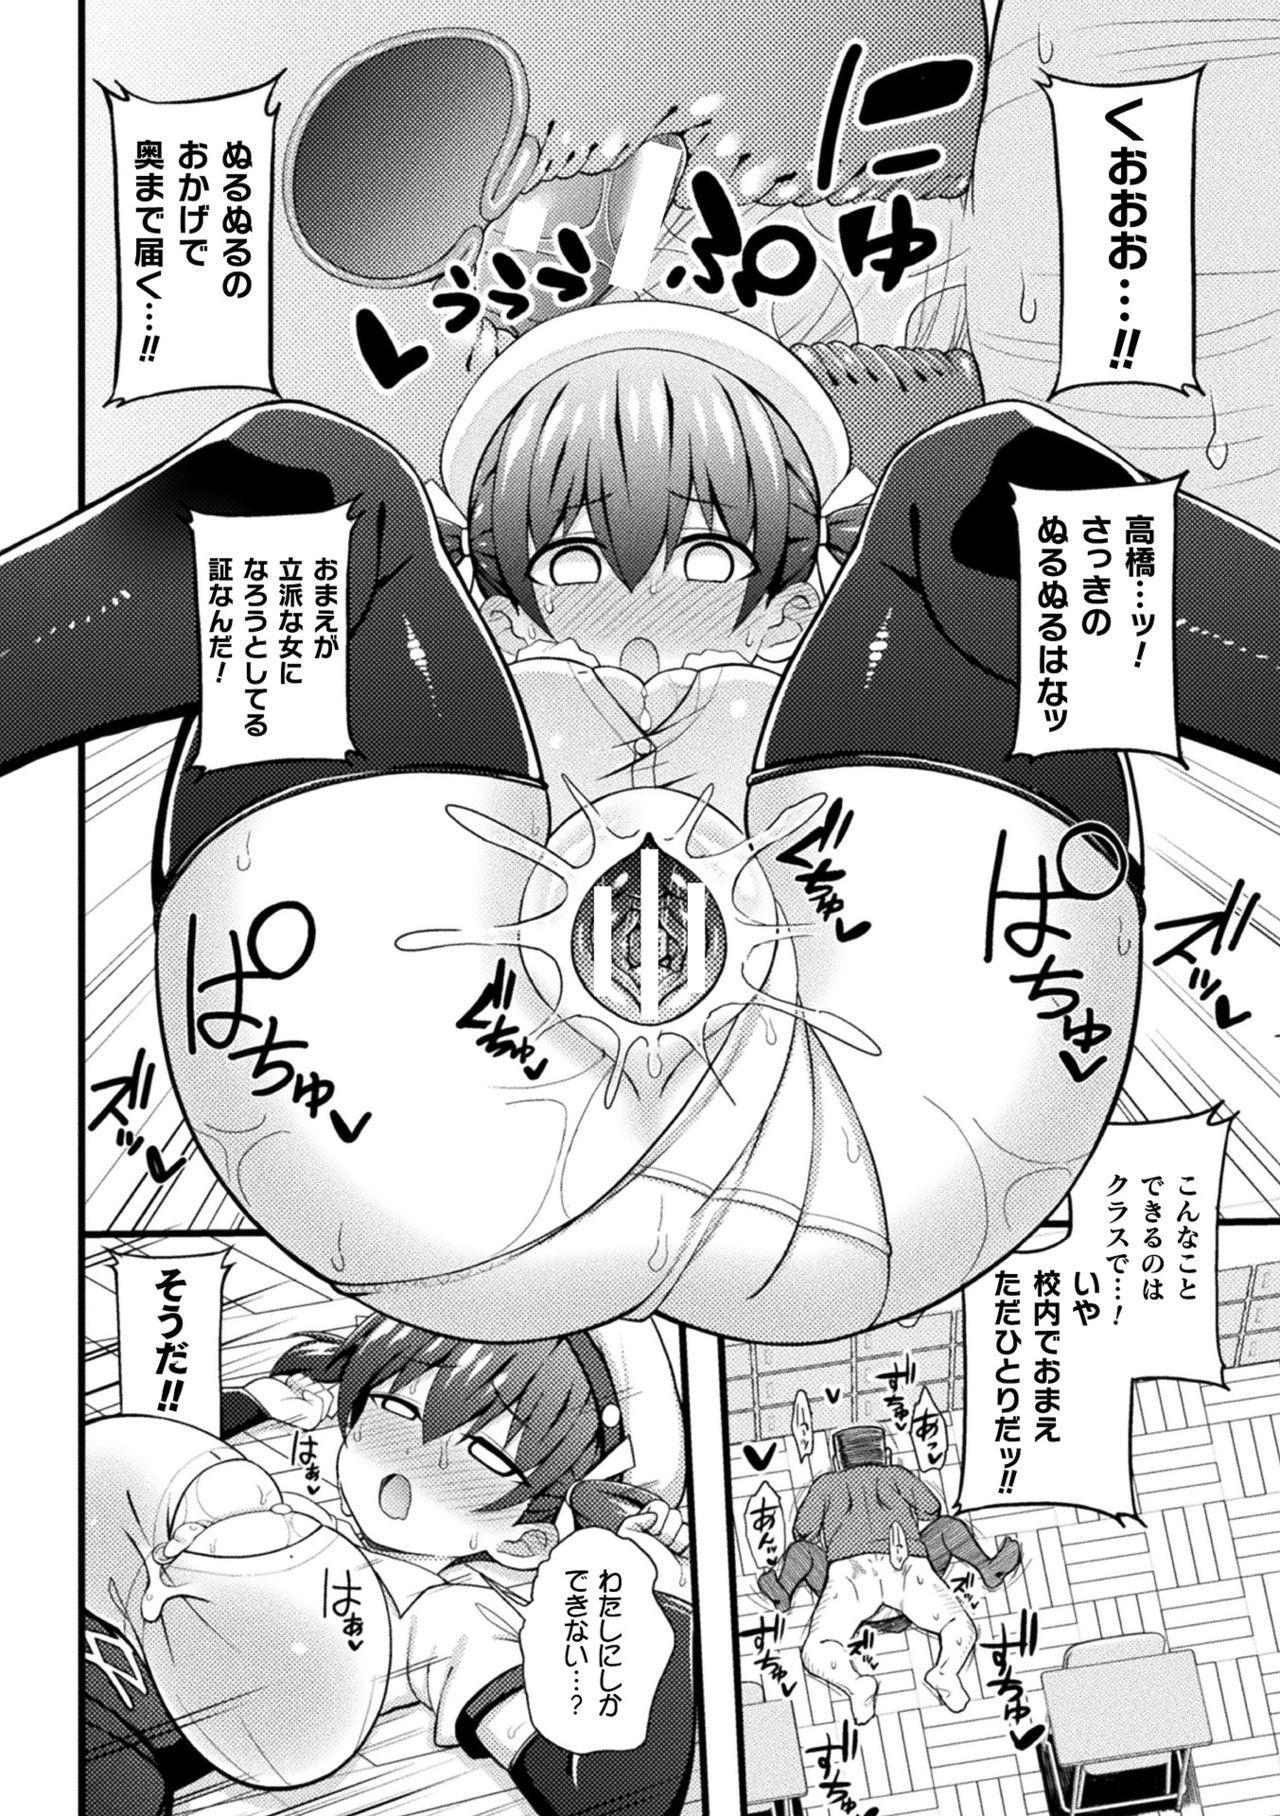 2D Comic Magazine Ero Chishiki 0 na Heroine Damashite Ryoujoku Muchix! Vol. 1 55